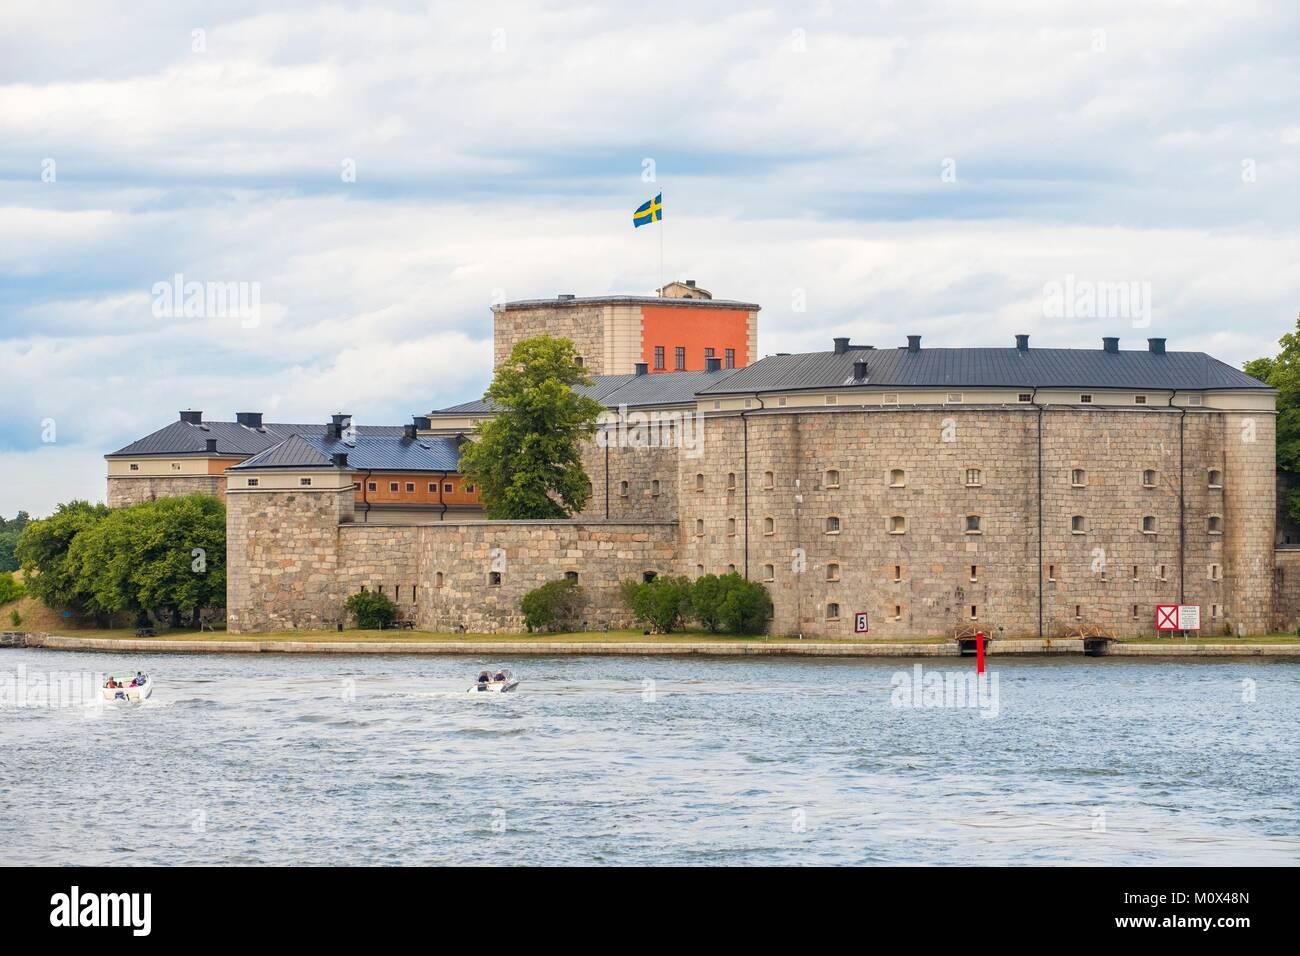 Sweden,Stockholm archipelago,Vaxholm,Fortress Castle built on an islet - Stock Image